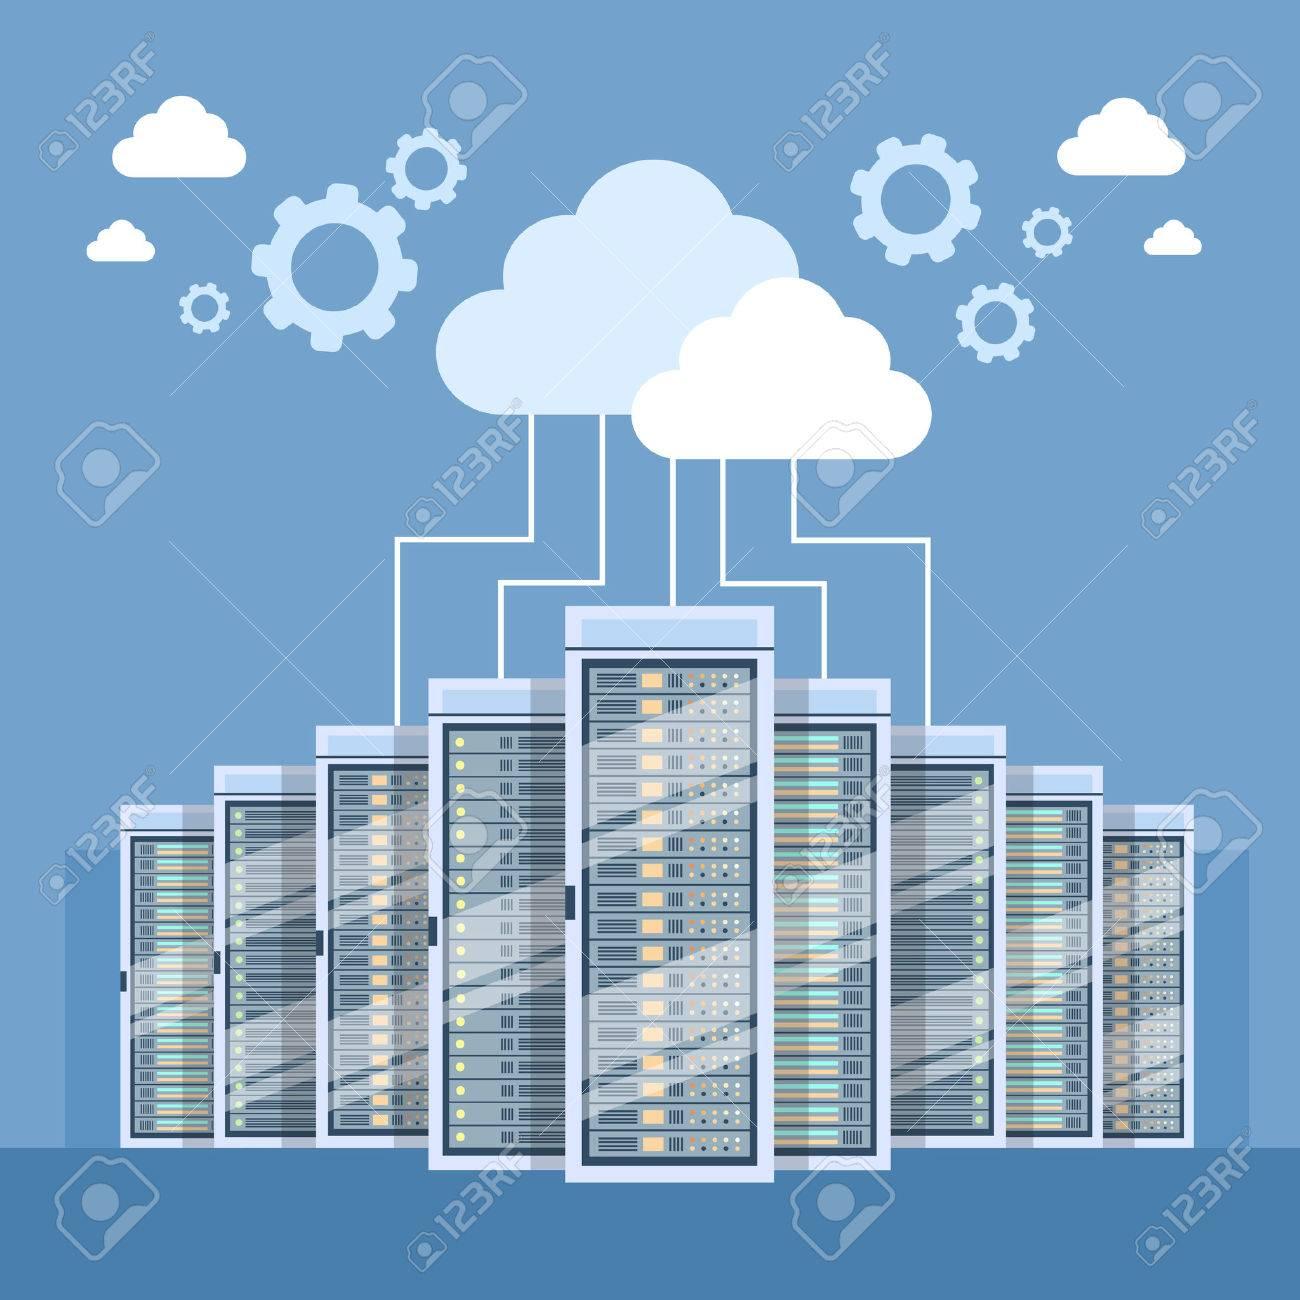 Data Center Cloud Connection Hosting Server Computer Information Database Synchronize Technology Flat Vector Illustration - 53396545